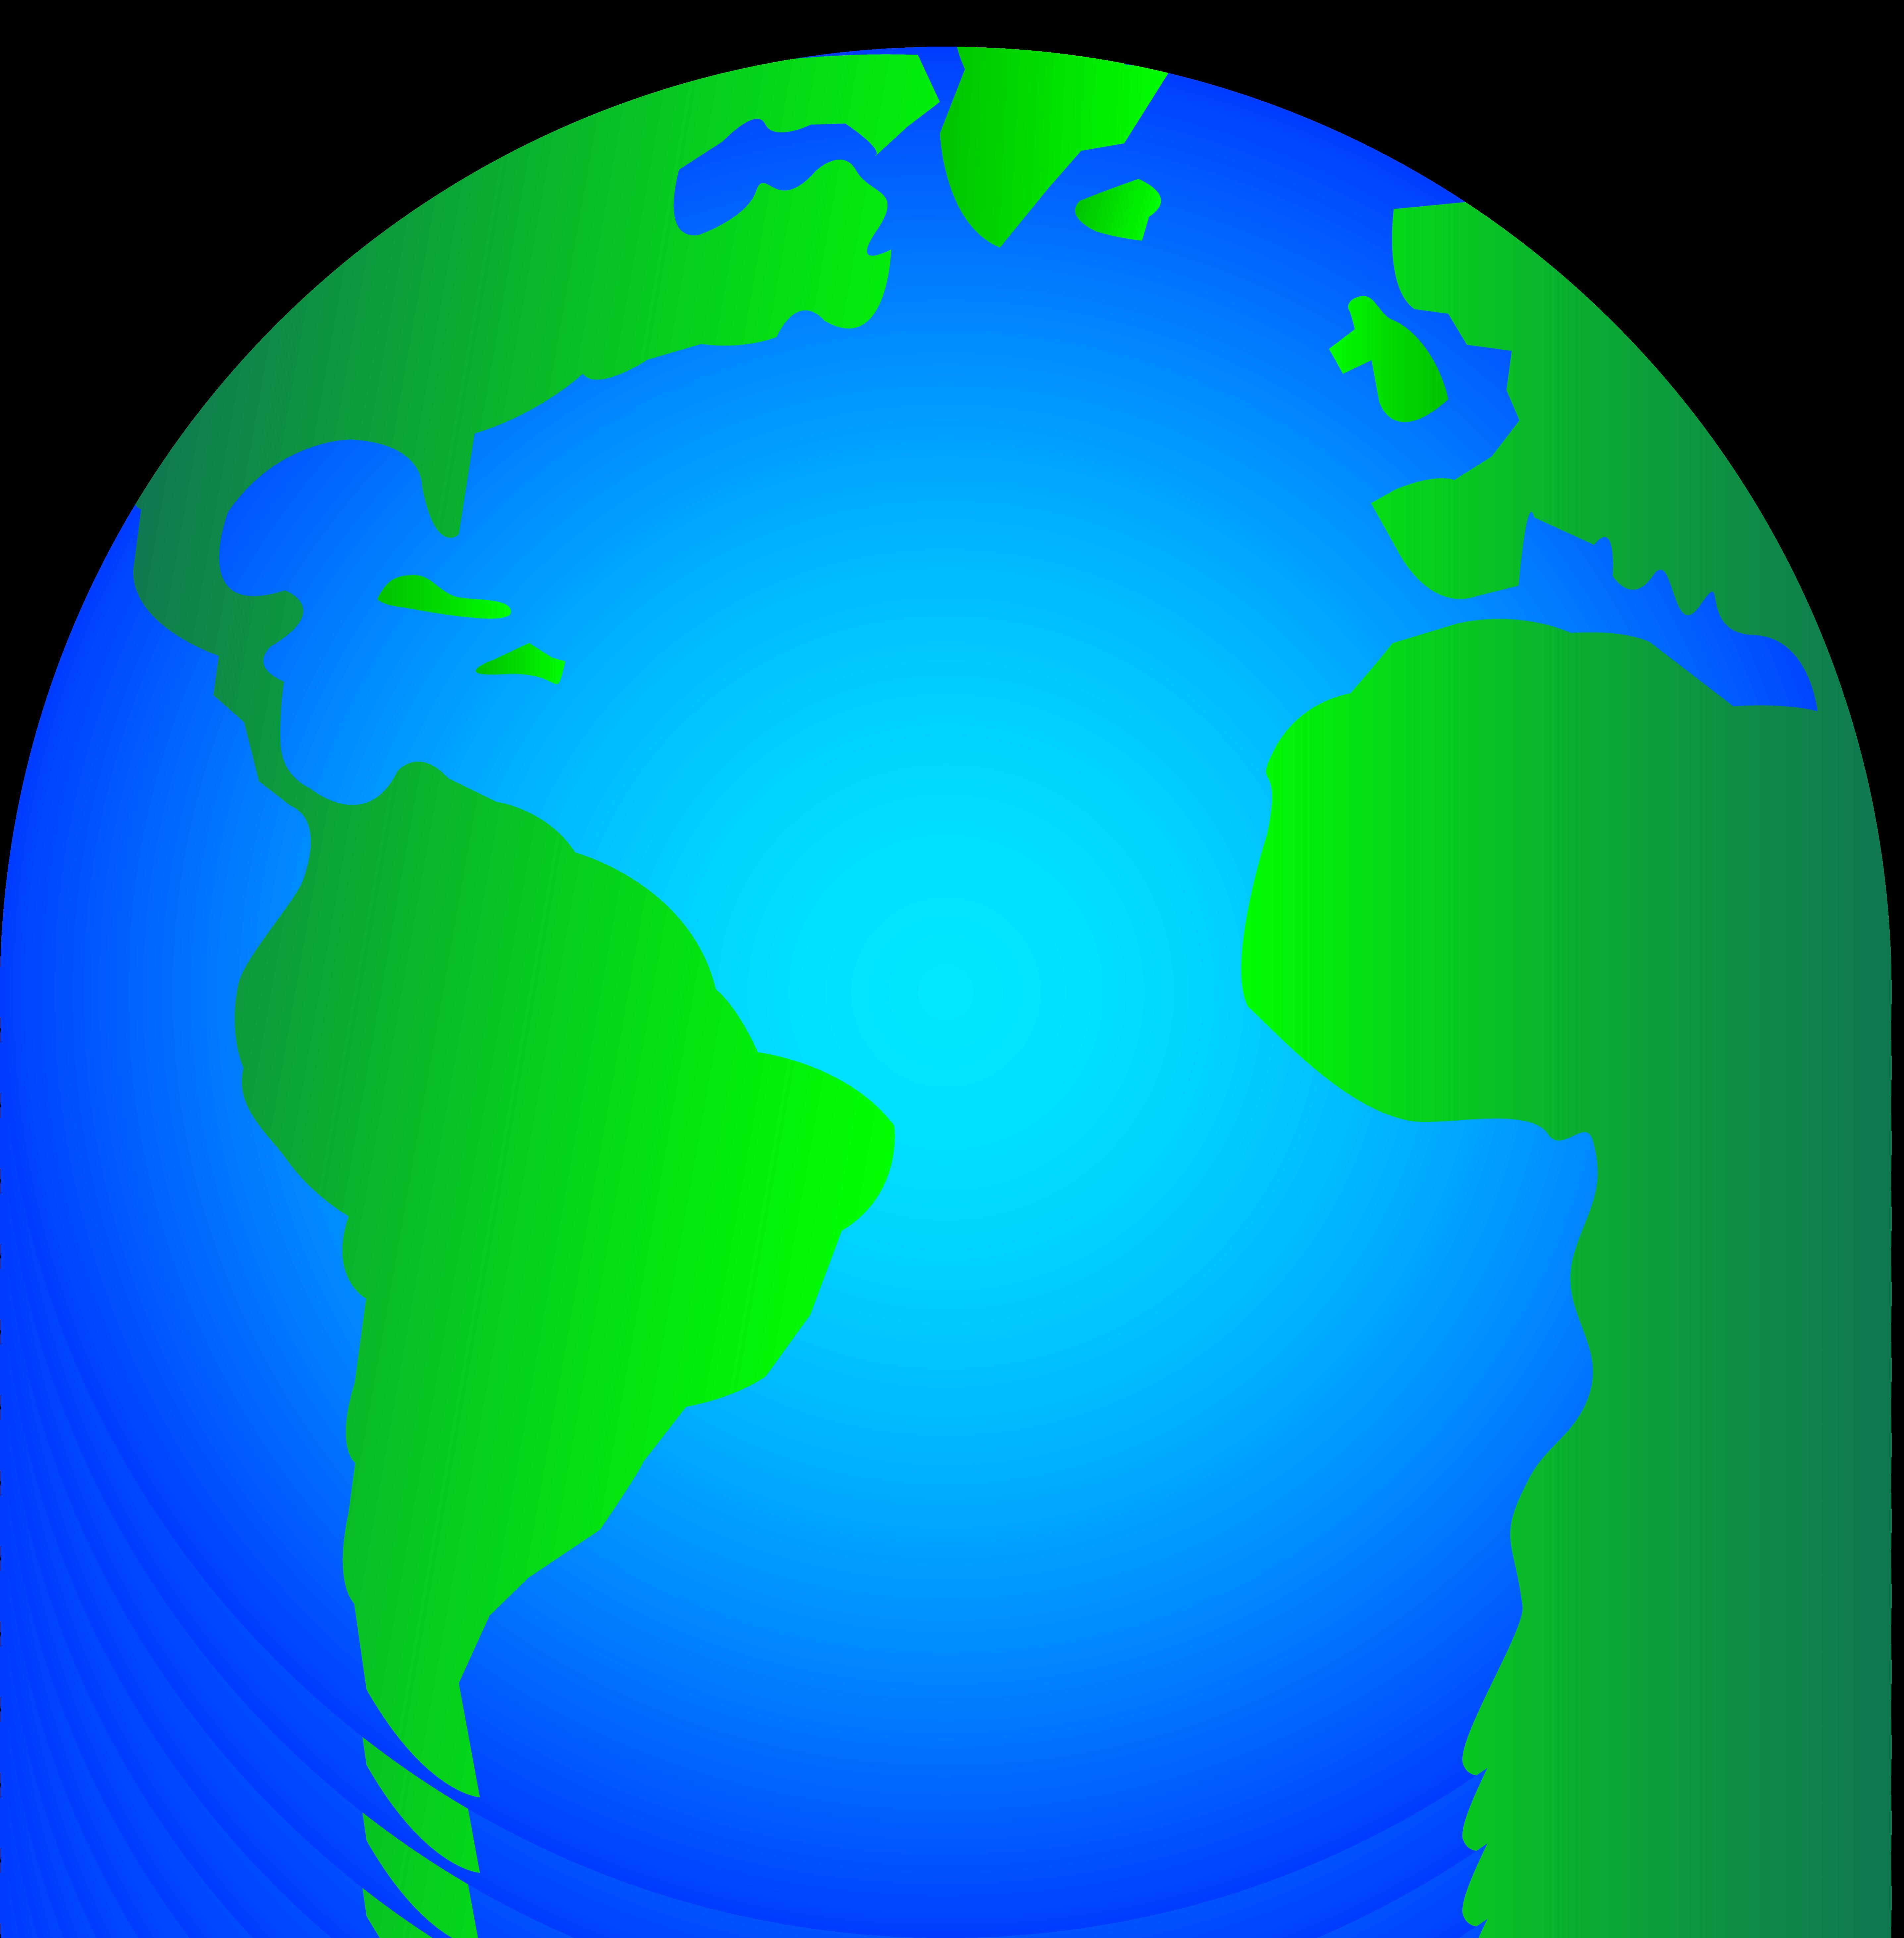 World Backgrounds, Compatible - PC, Mobile, Gadgets| 5748x5852 px